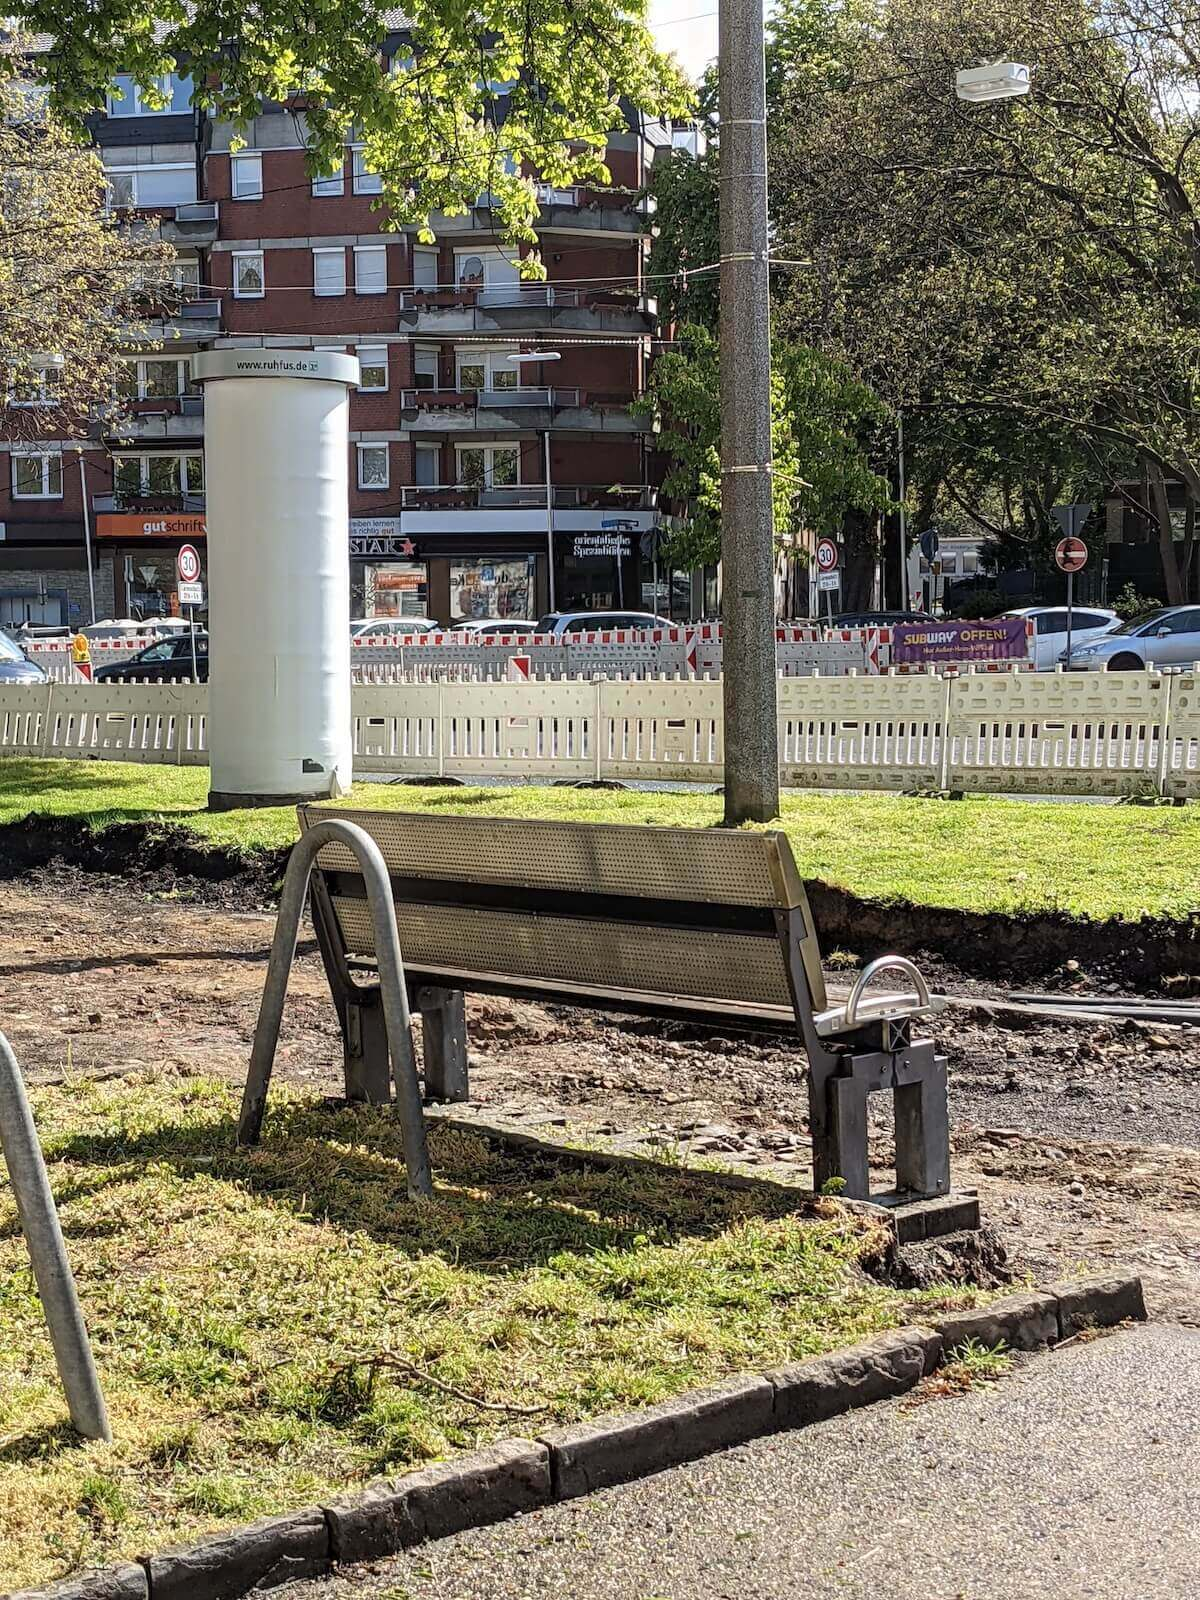 Leere Sitzbank am Bauabschnitt symbolisiert Corona-bedingte Baupause am Radwall in Dortmund